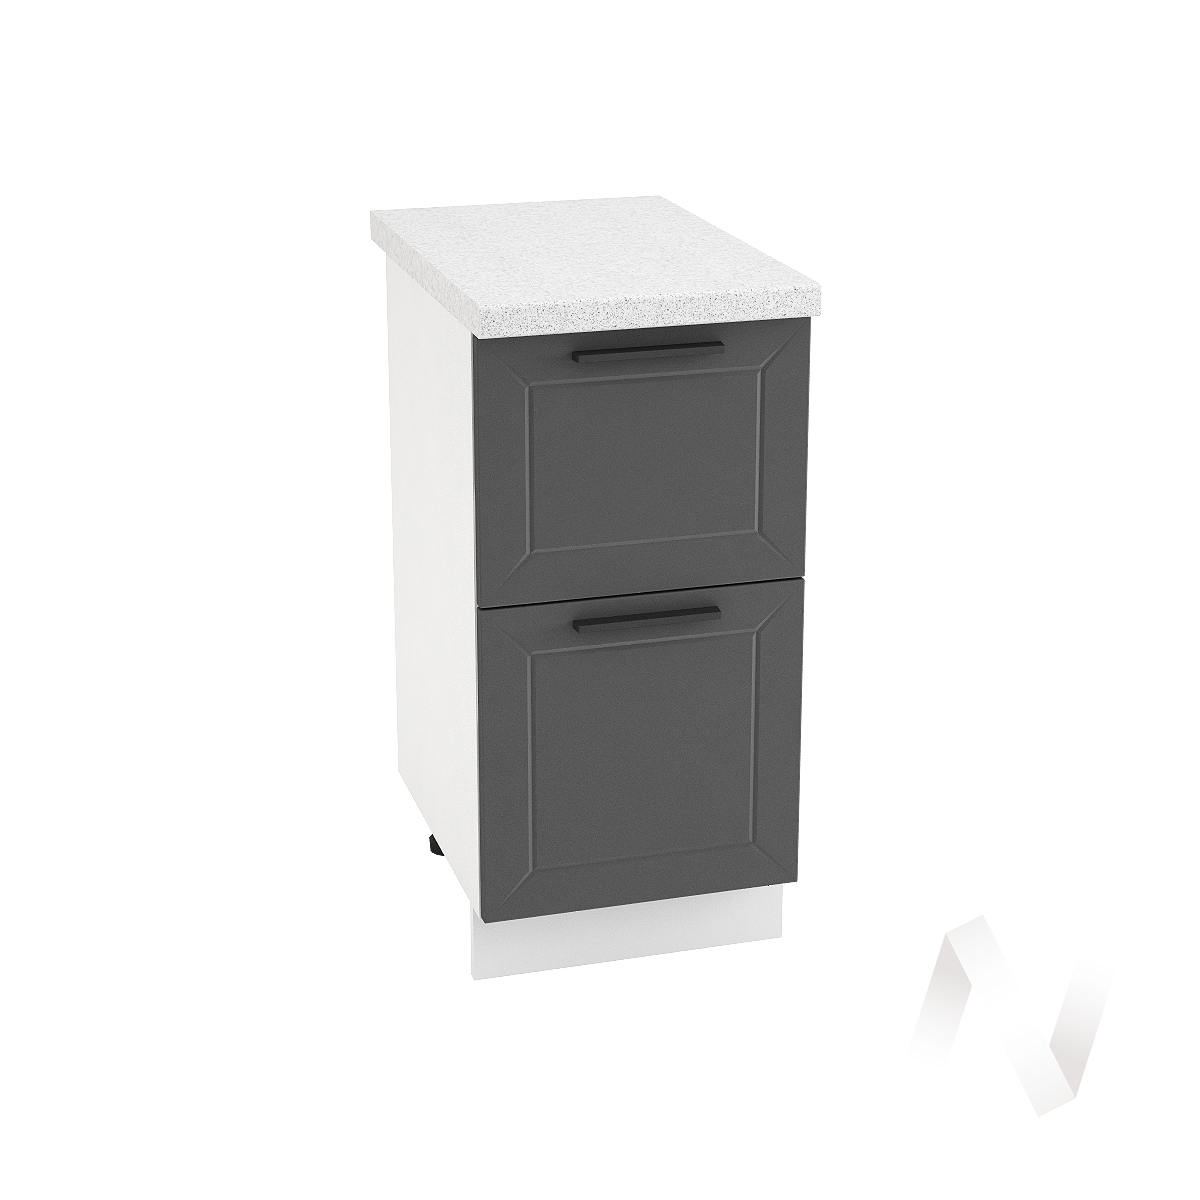 "Кухня ""Глетчер"": Шкаф нижний с 2-мя ящиками 400, ШН2Я 400 (Маренго силк/корпус белый)"